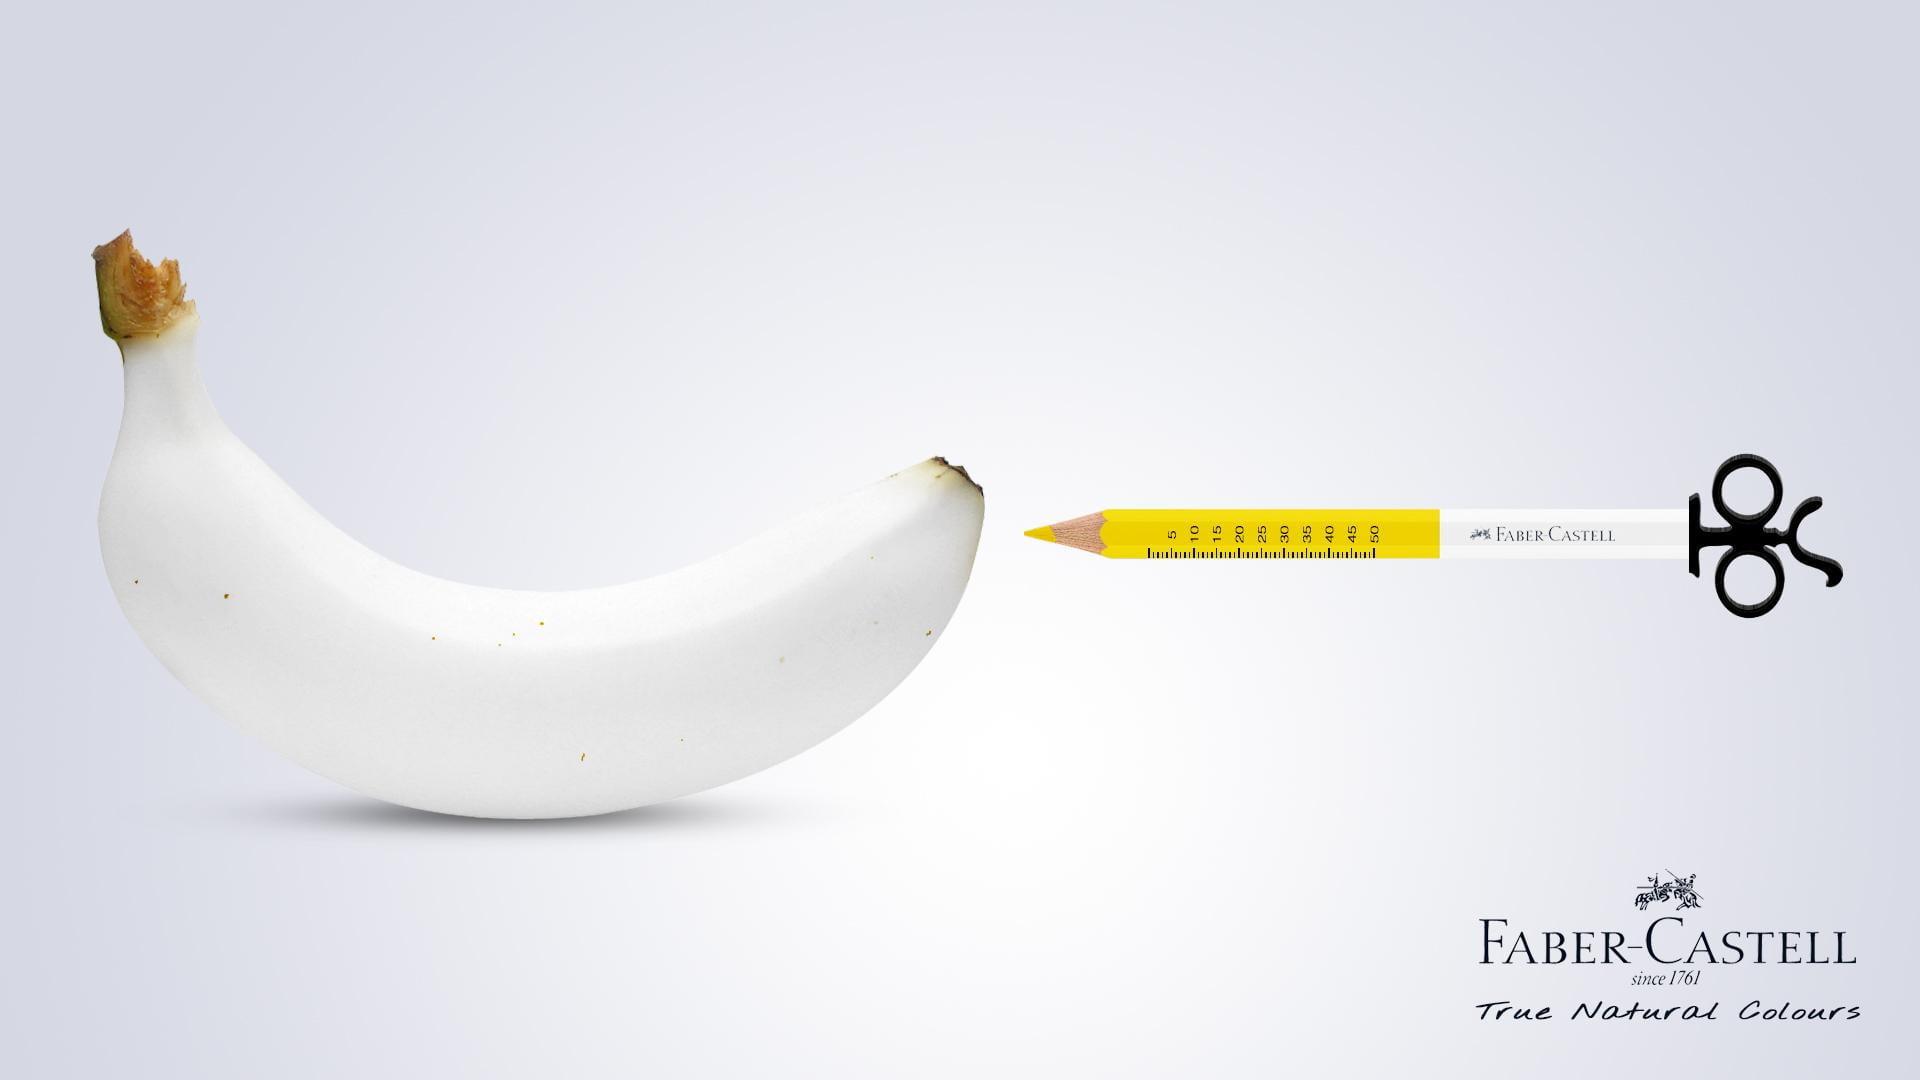 Faber-Castell banana